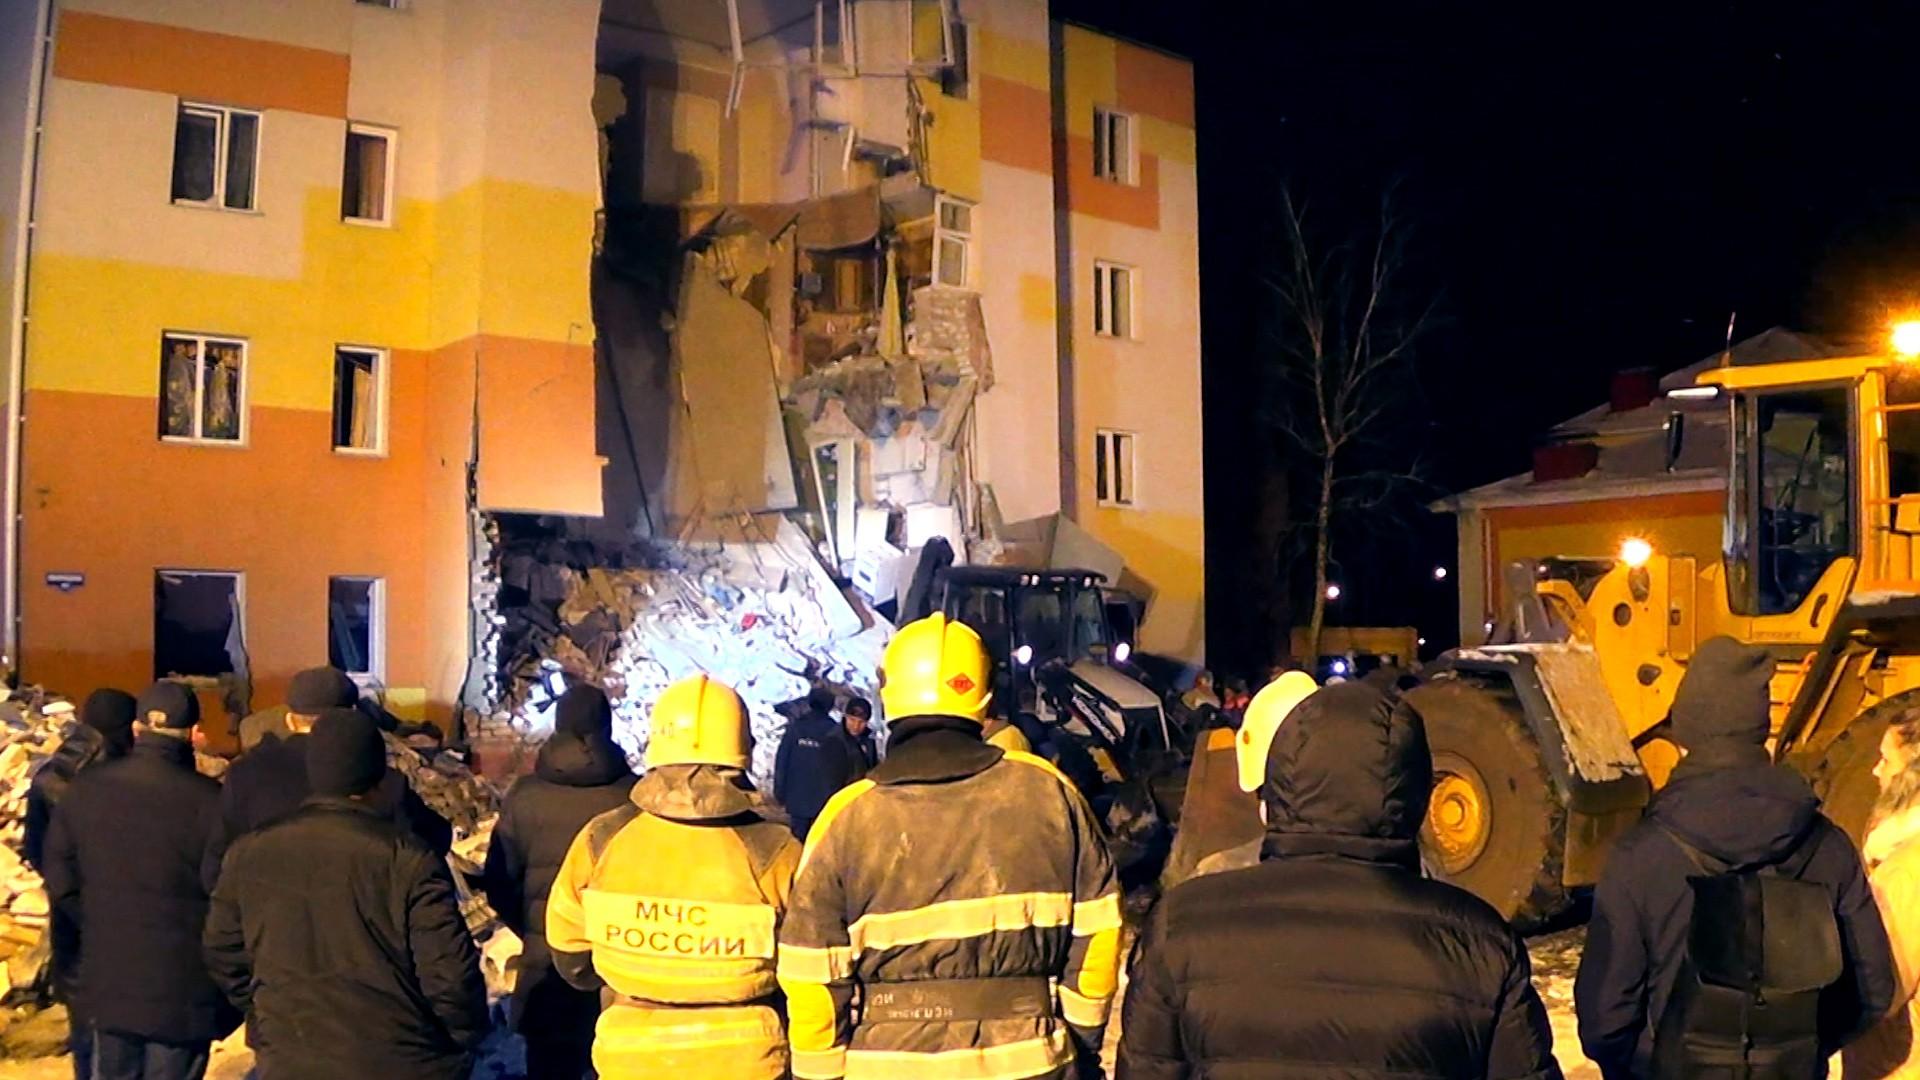 Сотрудники МЧС на месте взрыва газа в жилом доме